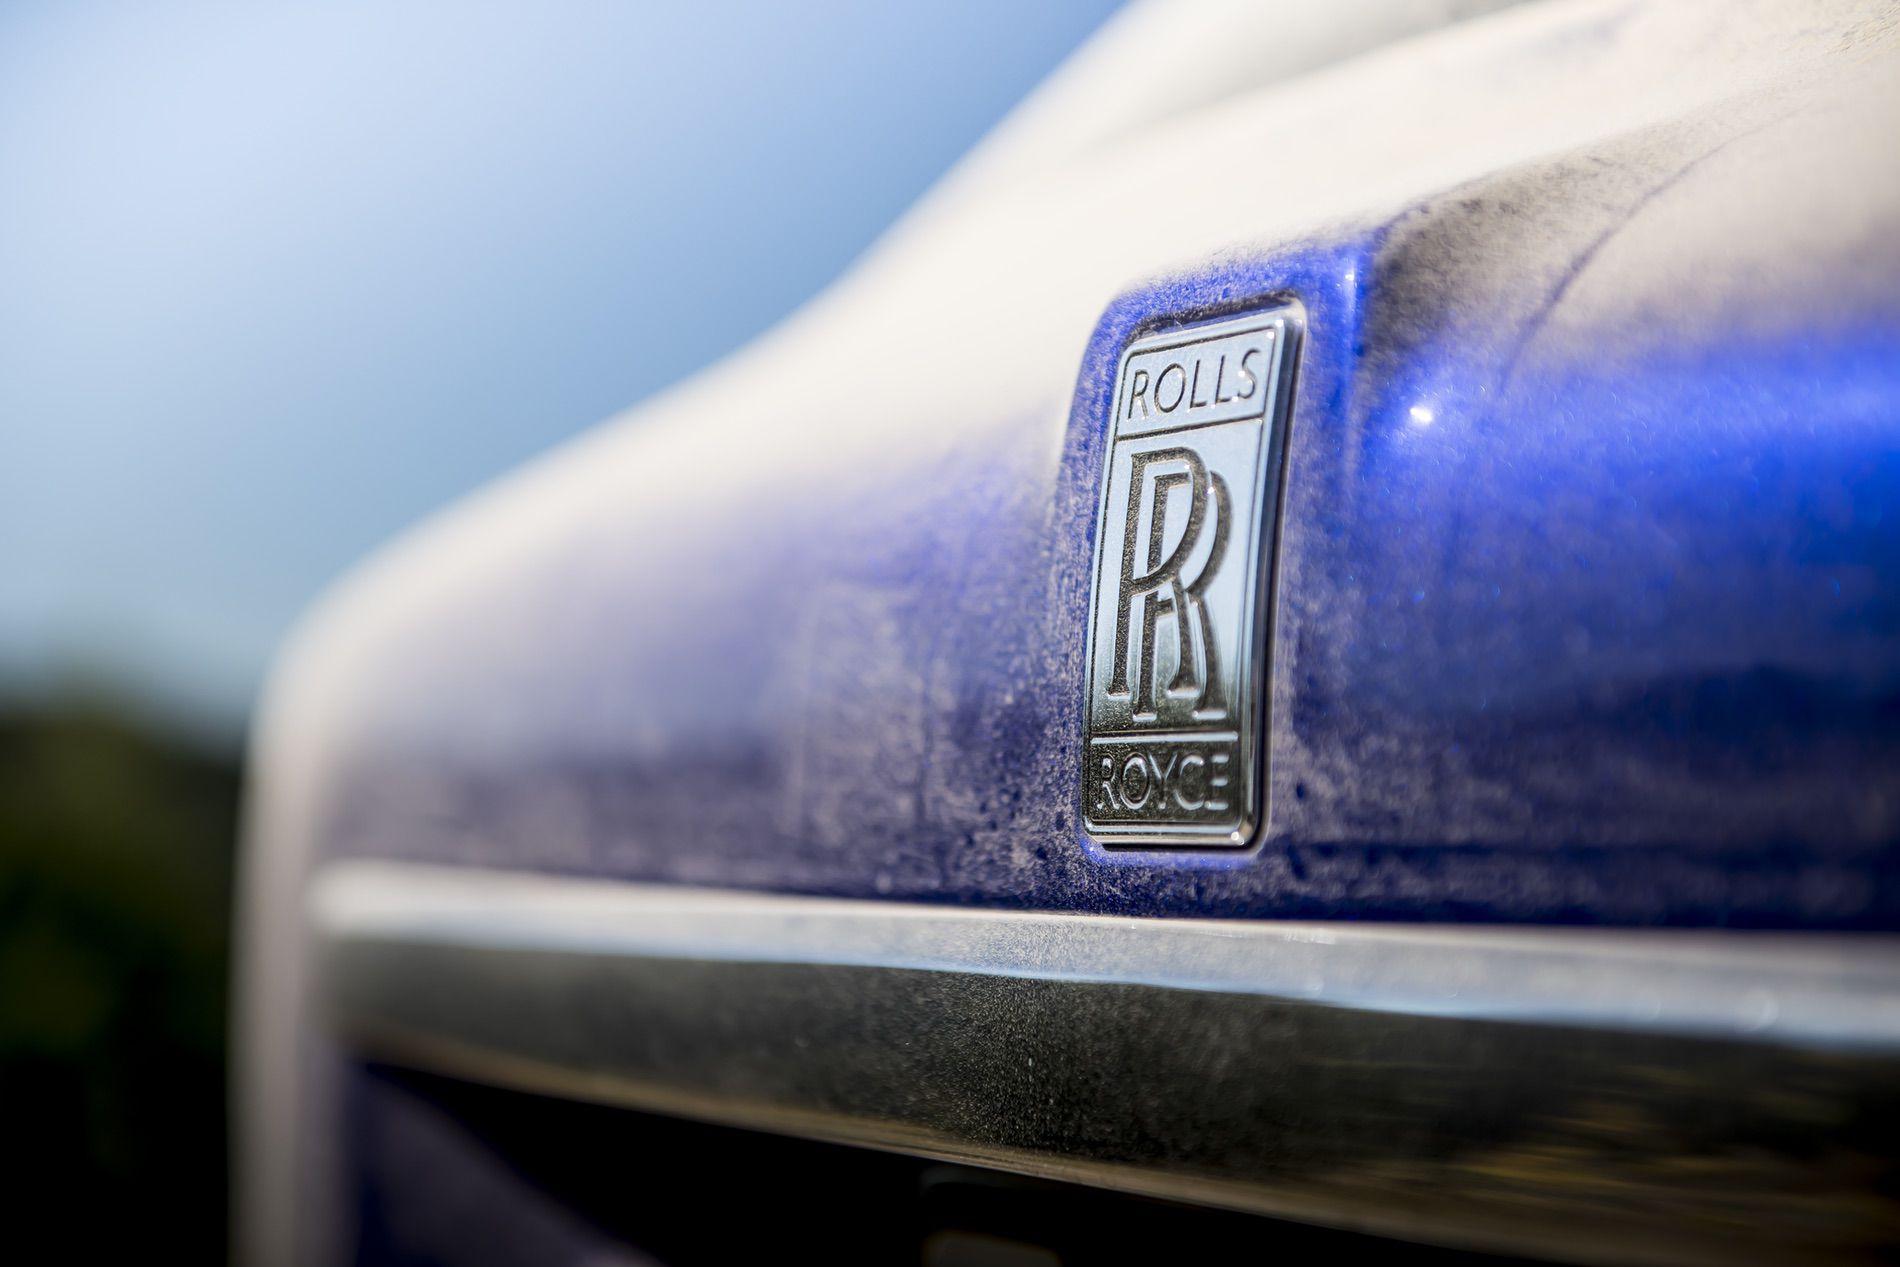 Rolls Royce Cullinan photos 53 1